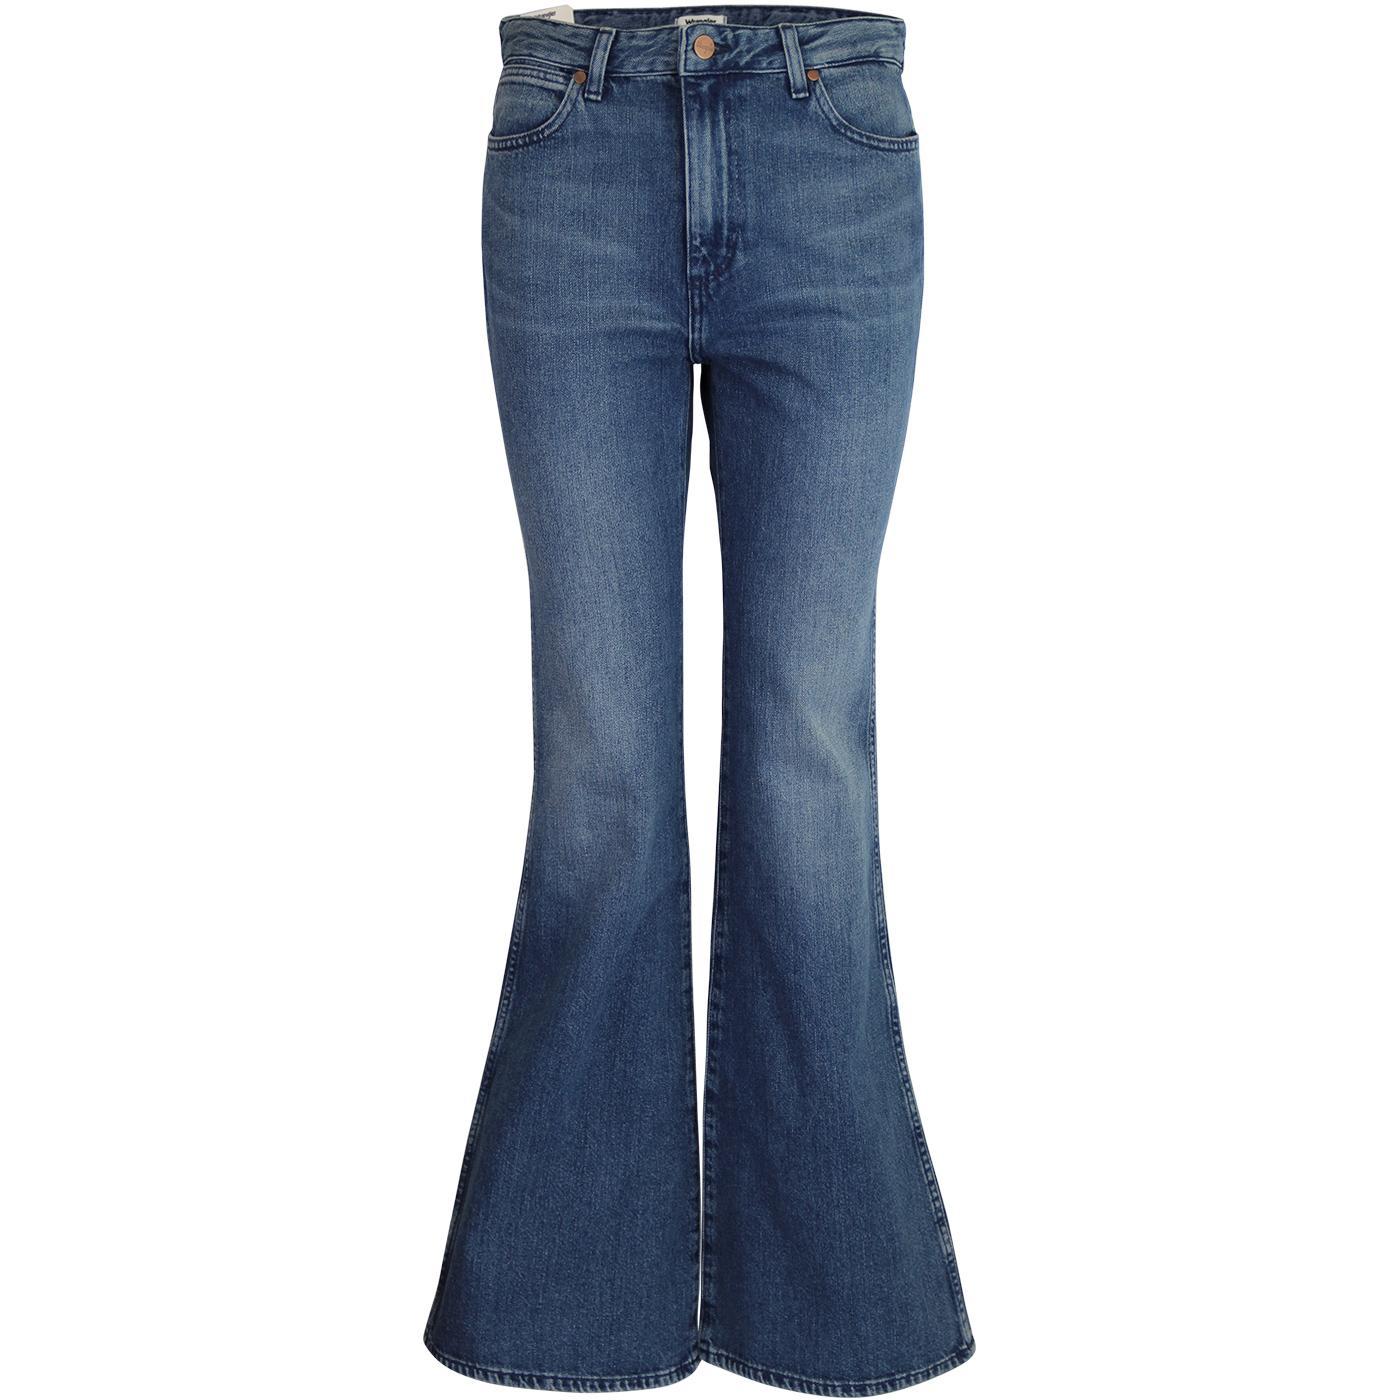 WRANGLER Women's 70s Retro Flare Jeans PINE FIELD